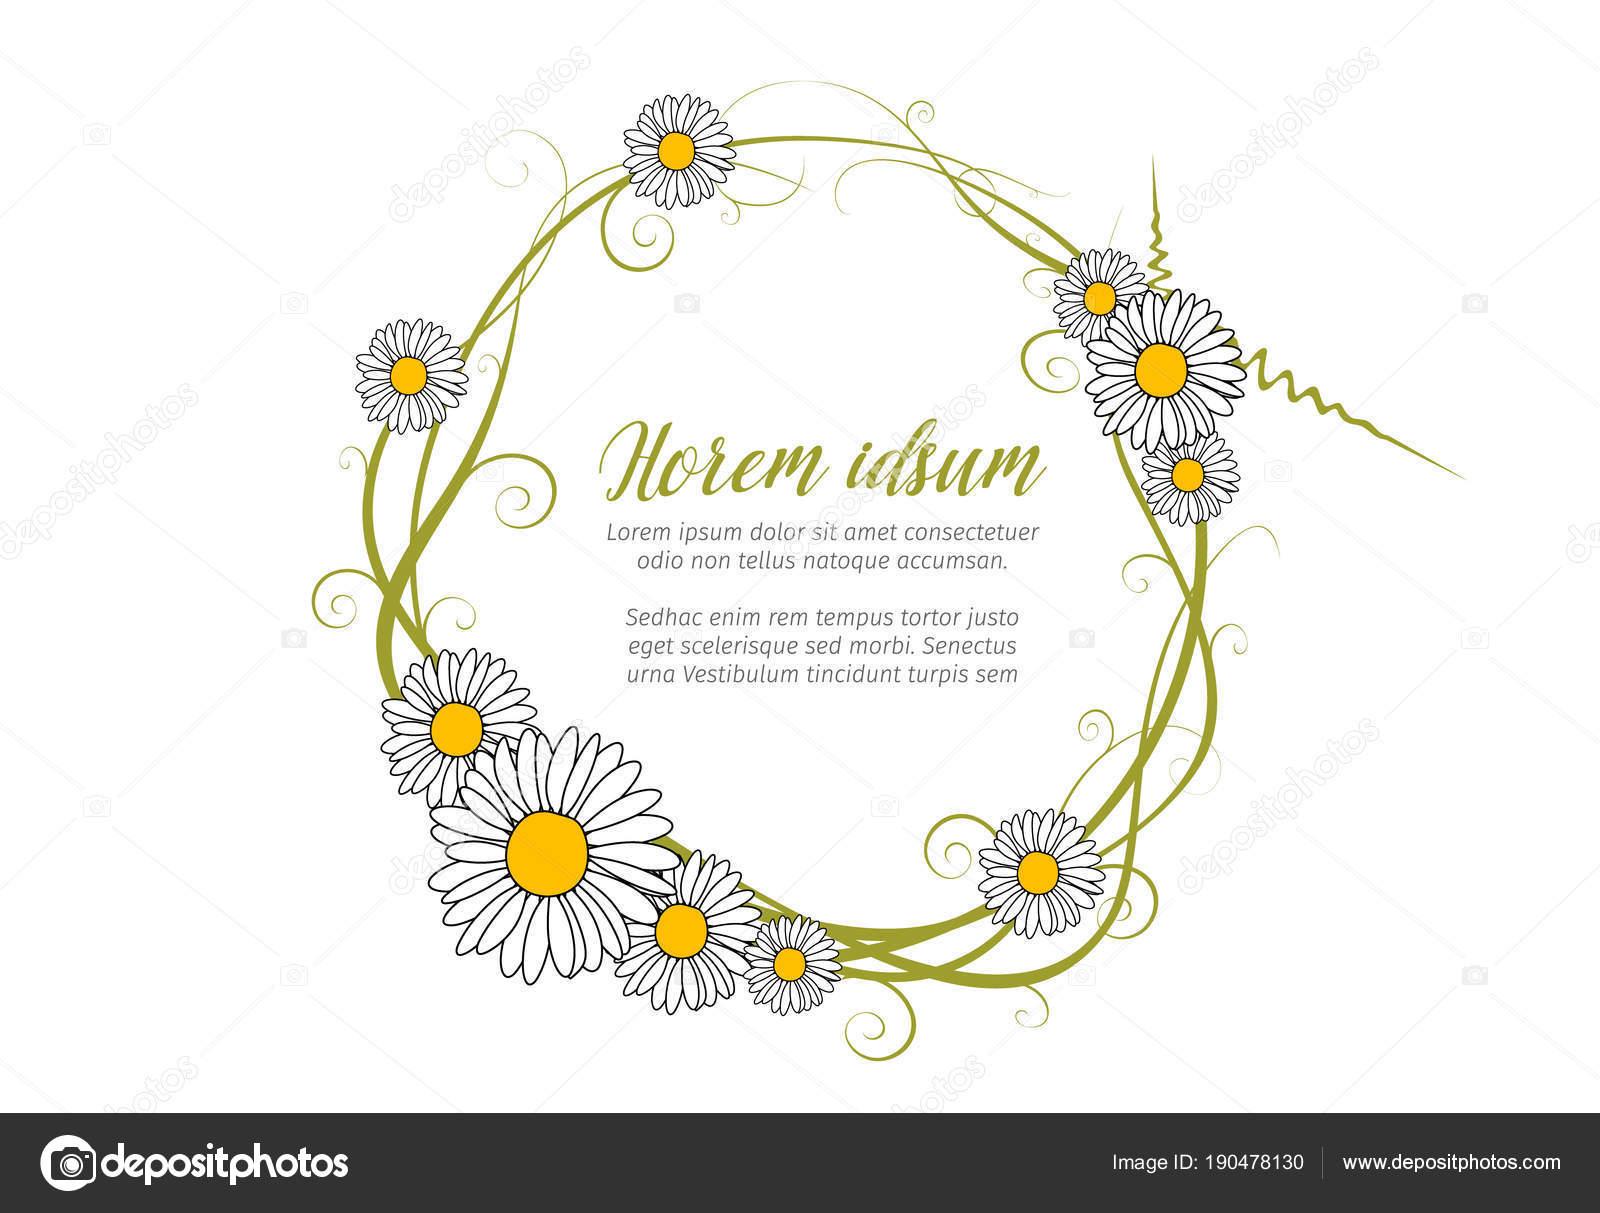 Vector Plantilla Marco Daisy Para Carta Amor Ronda — Archivo ...